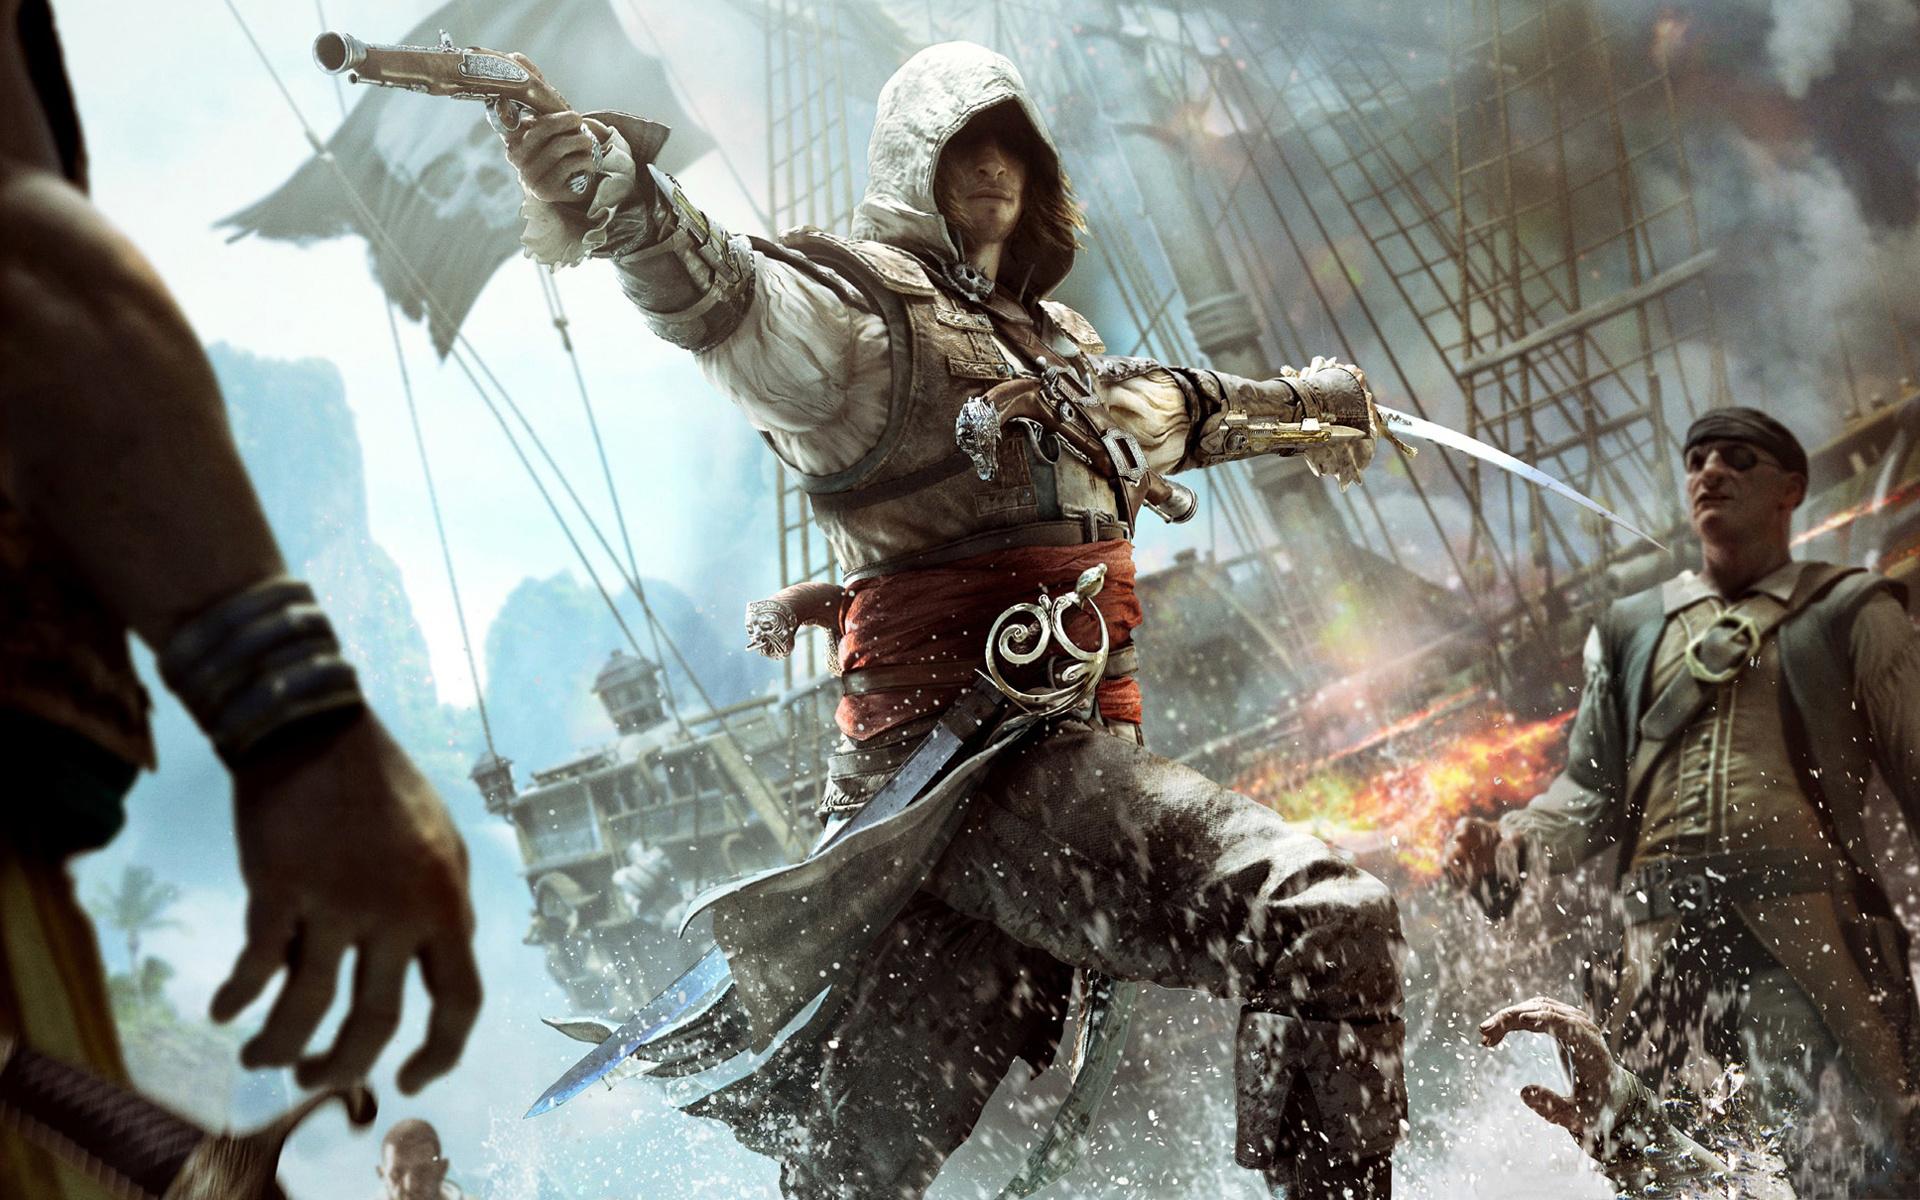 Assassins Creed 4 Multiplayer Femlae wallpaper 1920x1200